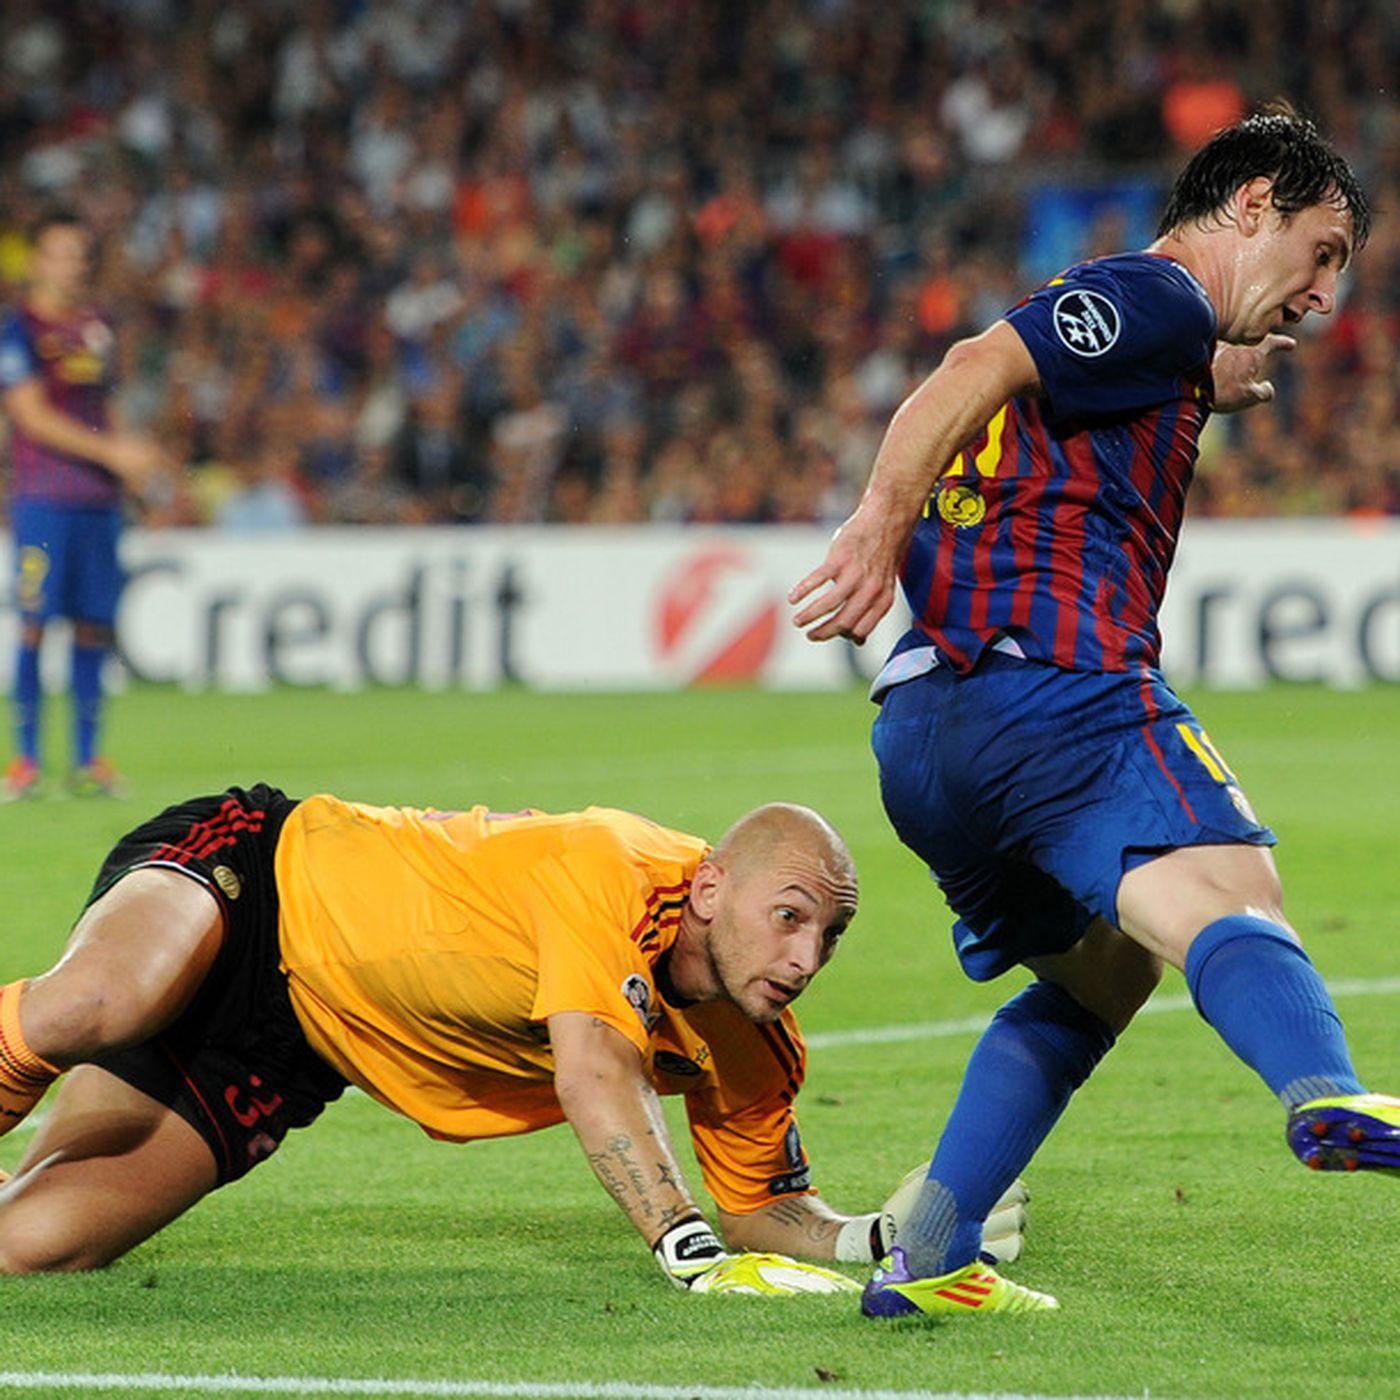 Uefa Champions League Fc Barcelona Vs Ac Milan Injuries Lineups And Matchups Barca Blaugranes